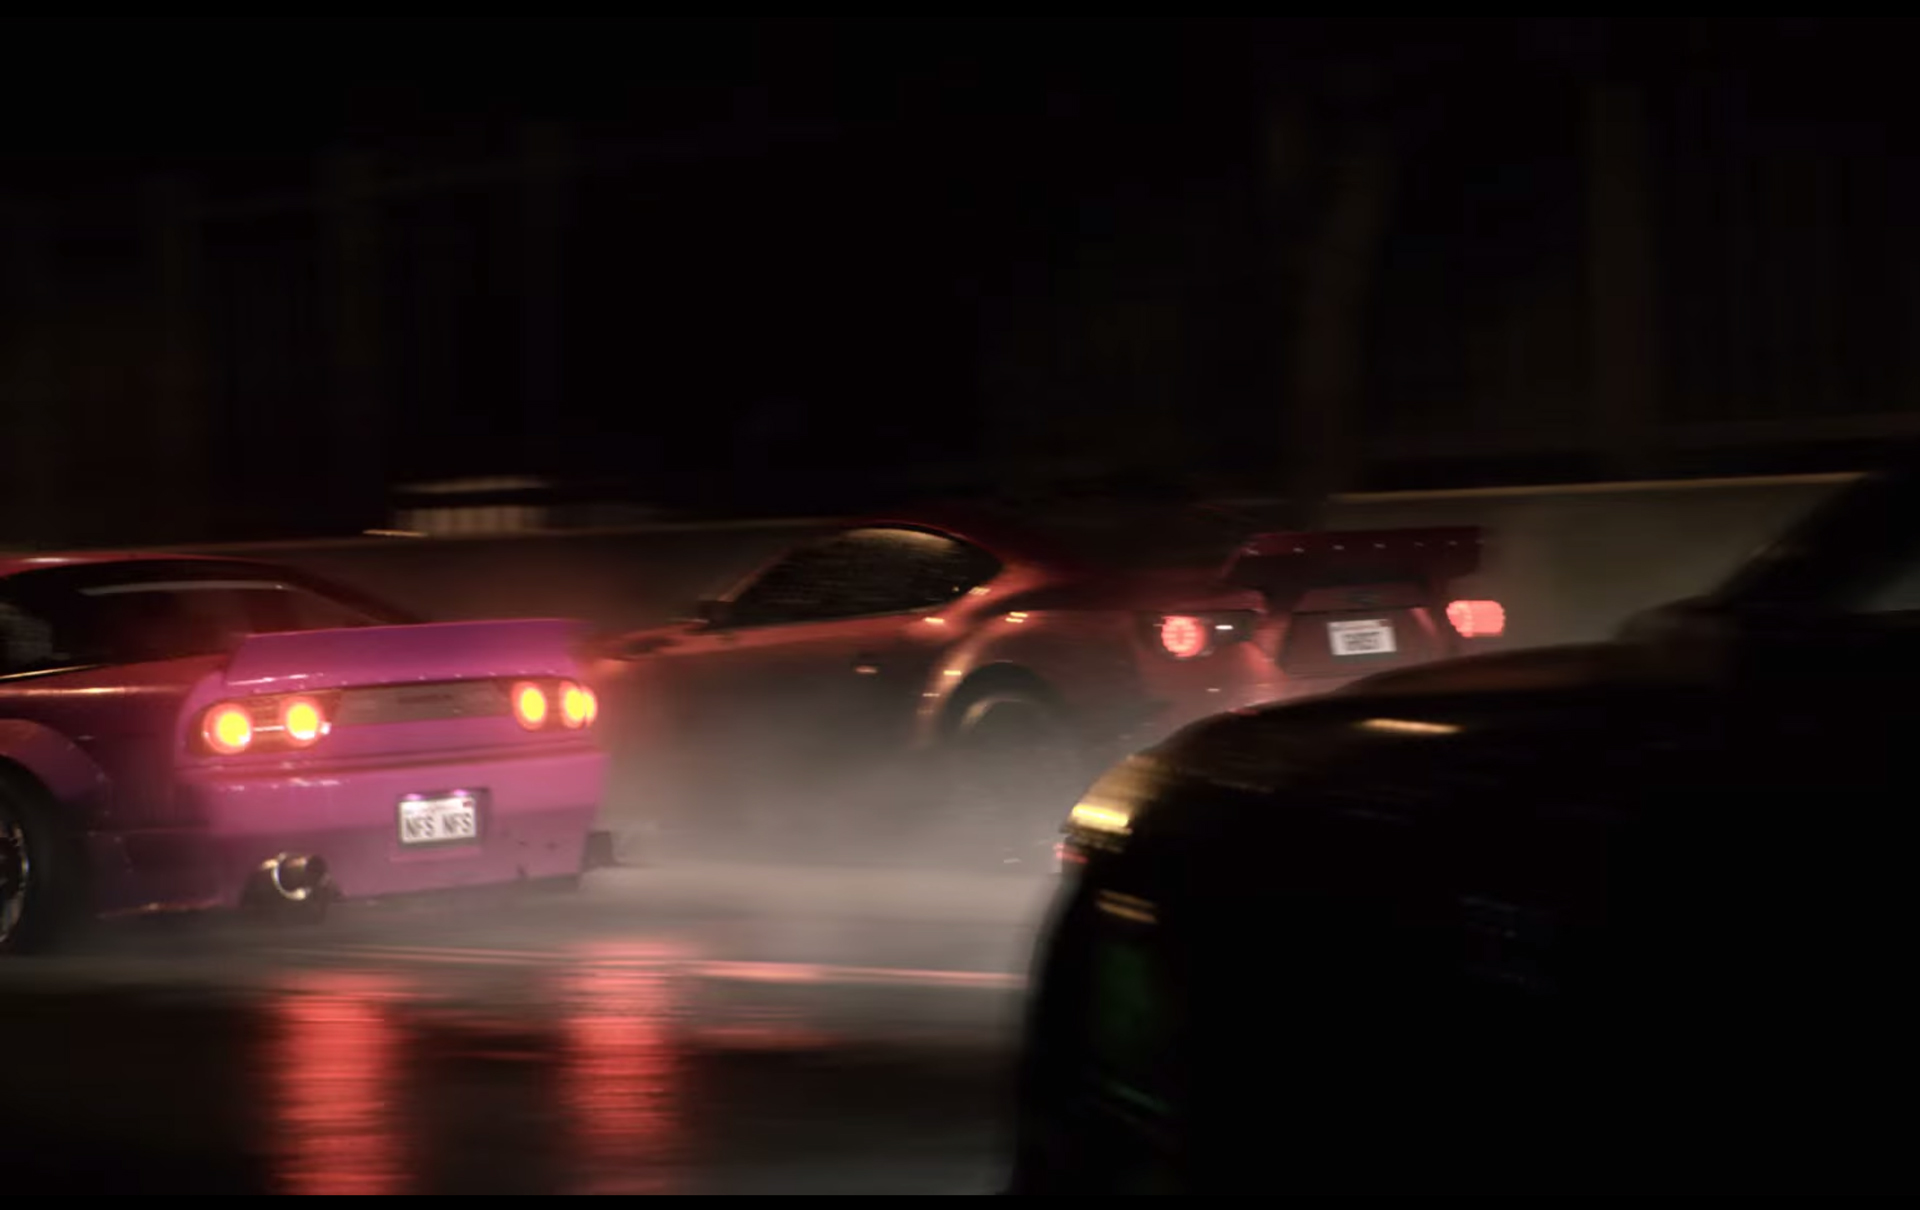 Need for Speed - Teaser 2015 - Subaru BRZ vs Nissan 180SX